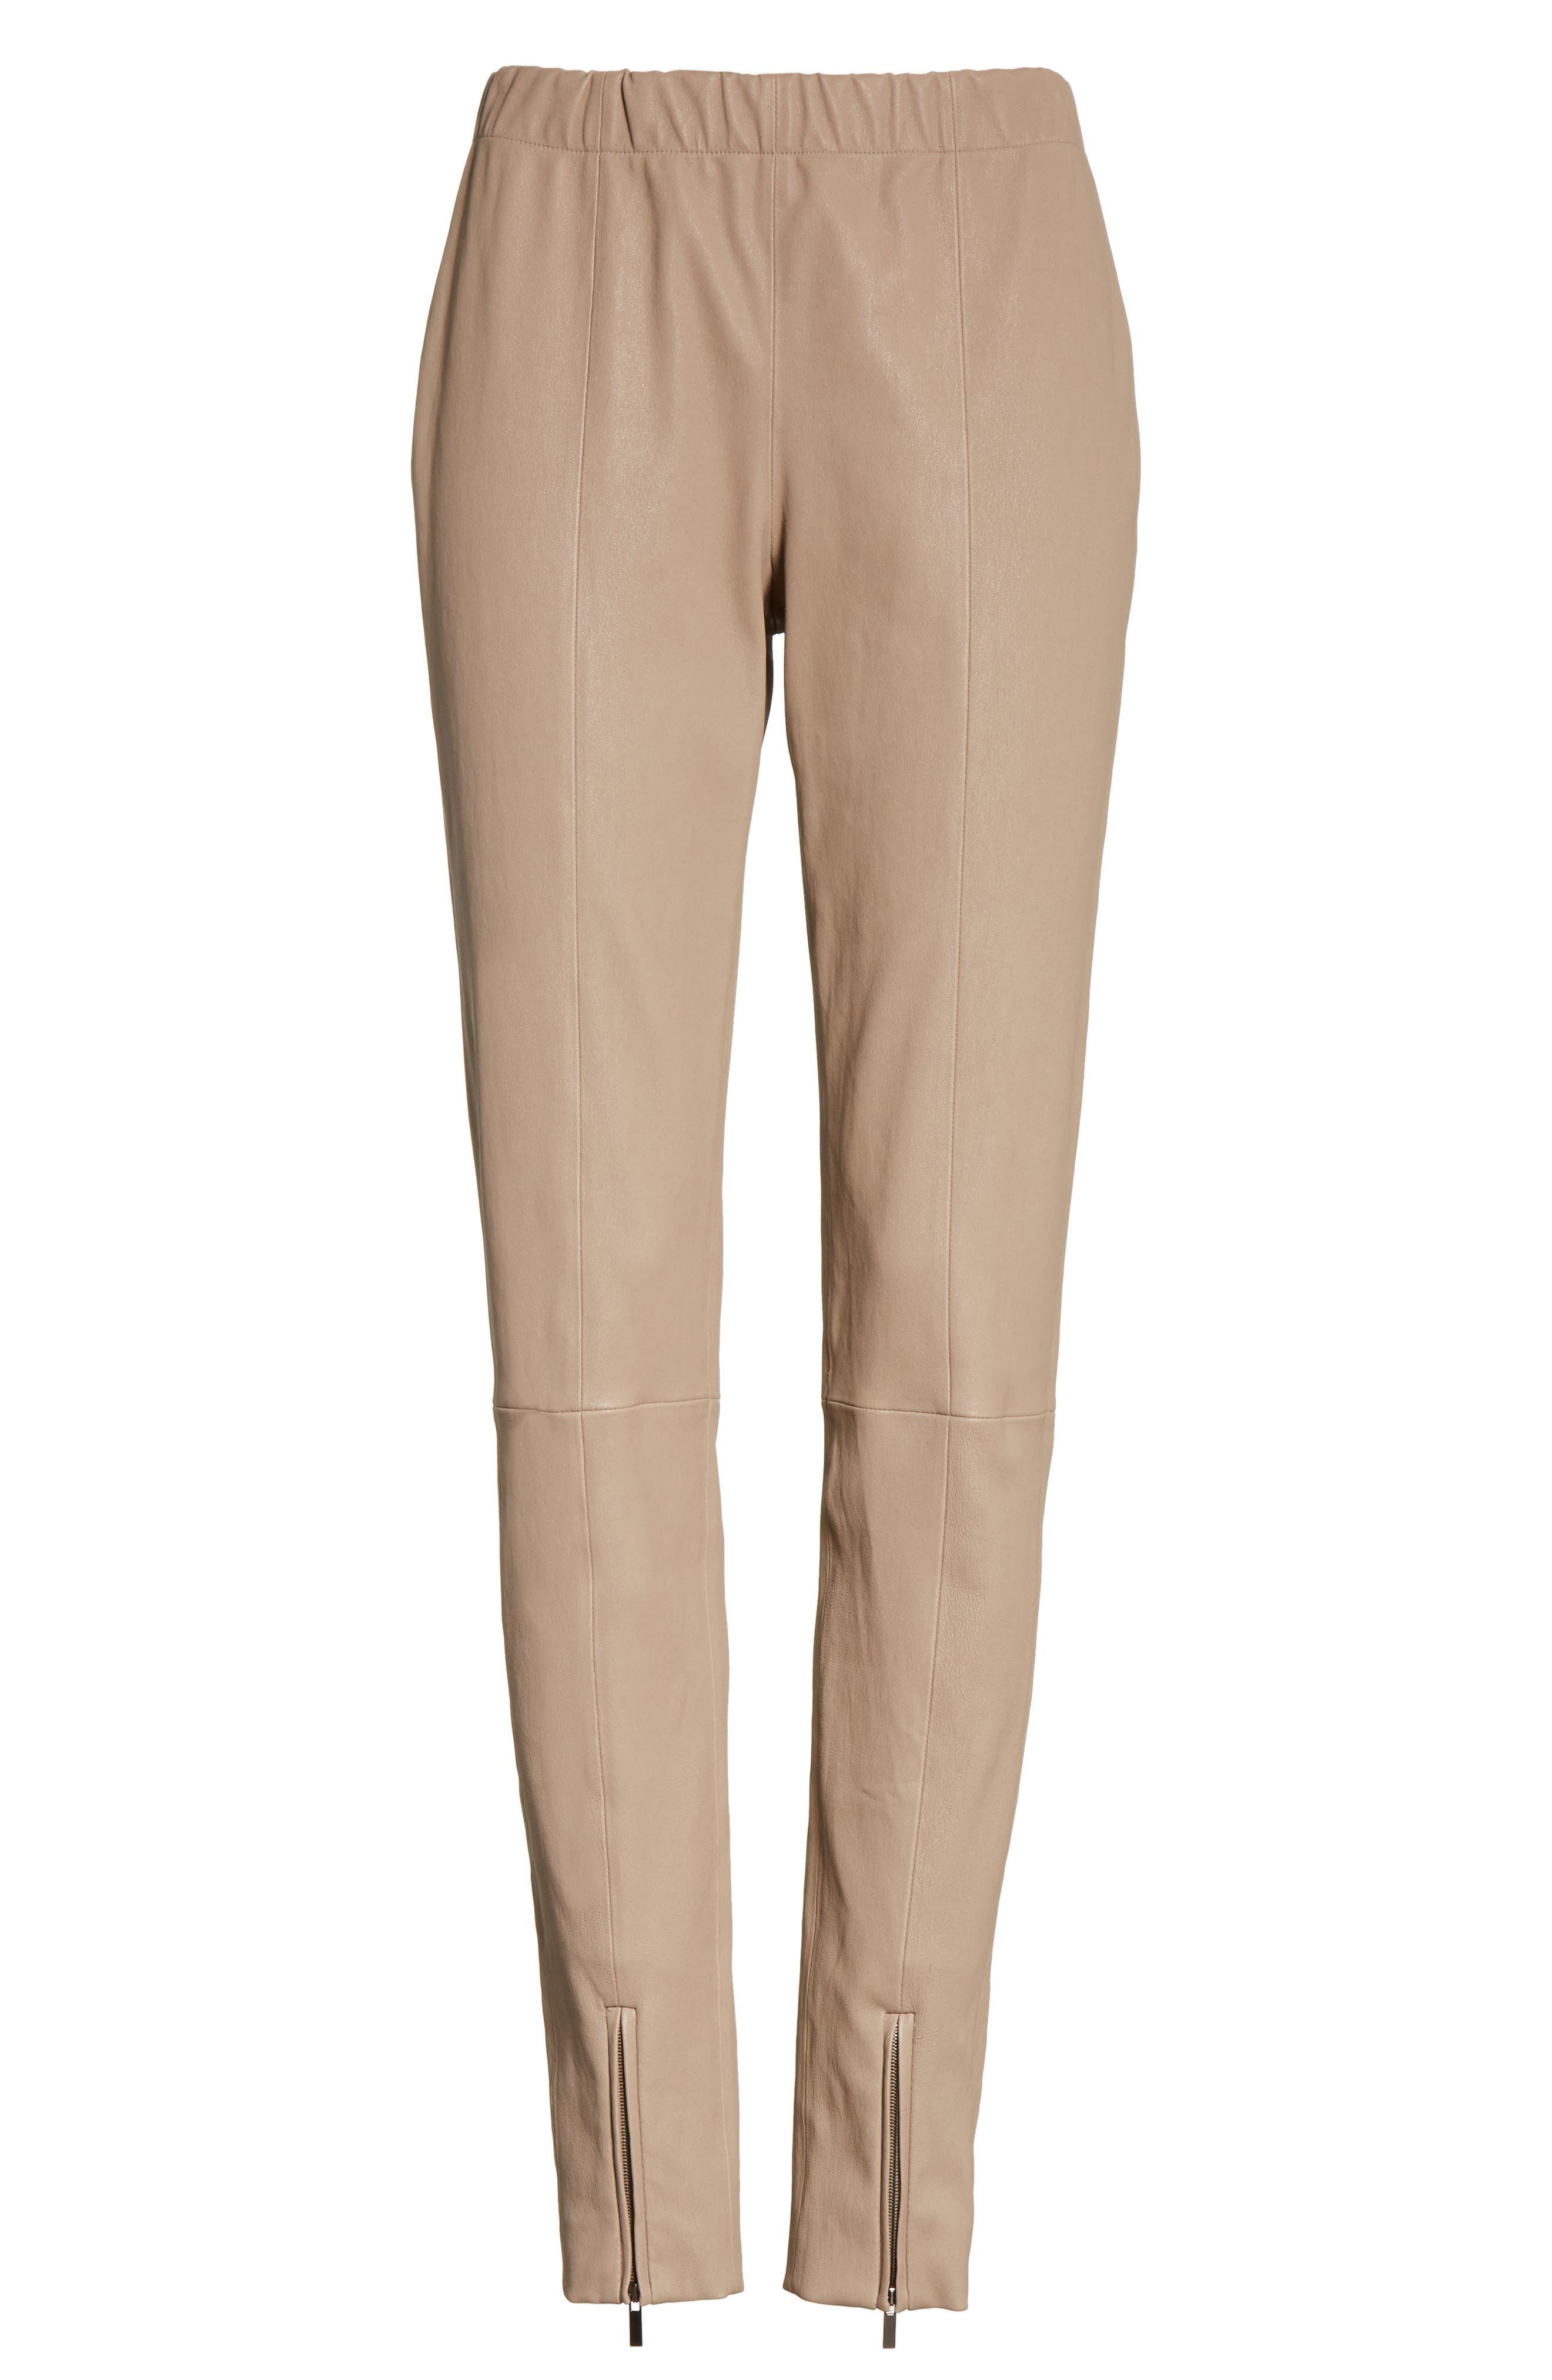 Stretch Leather Pants,                             Alternate thumbnail 6, color,                             205